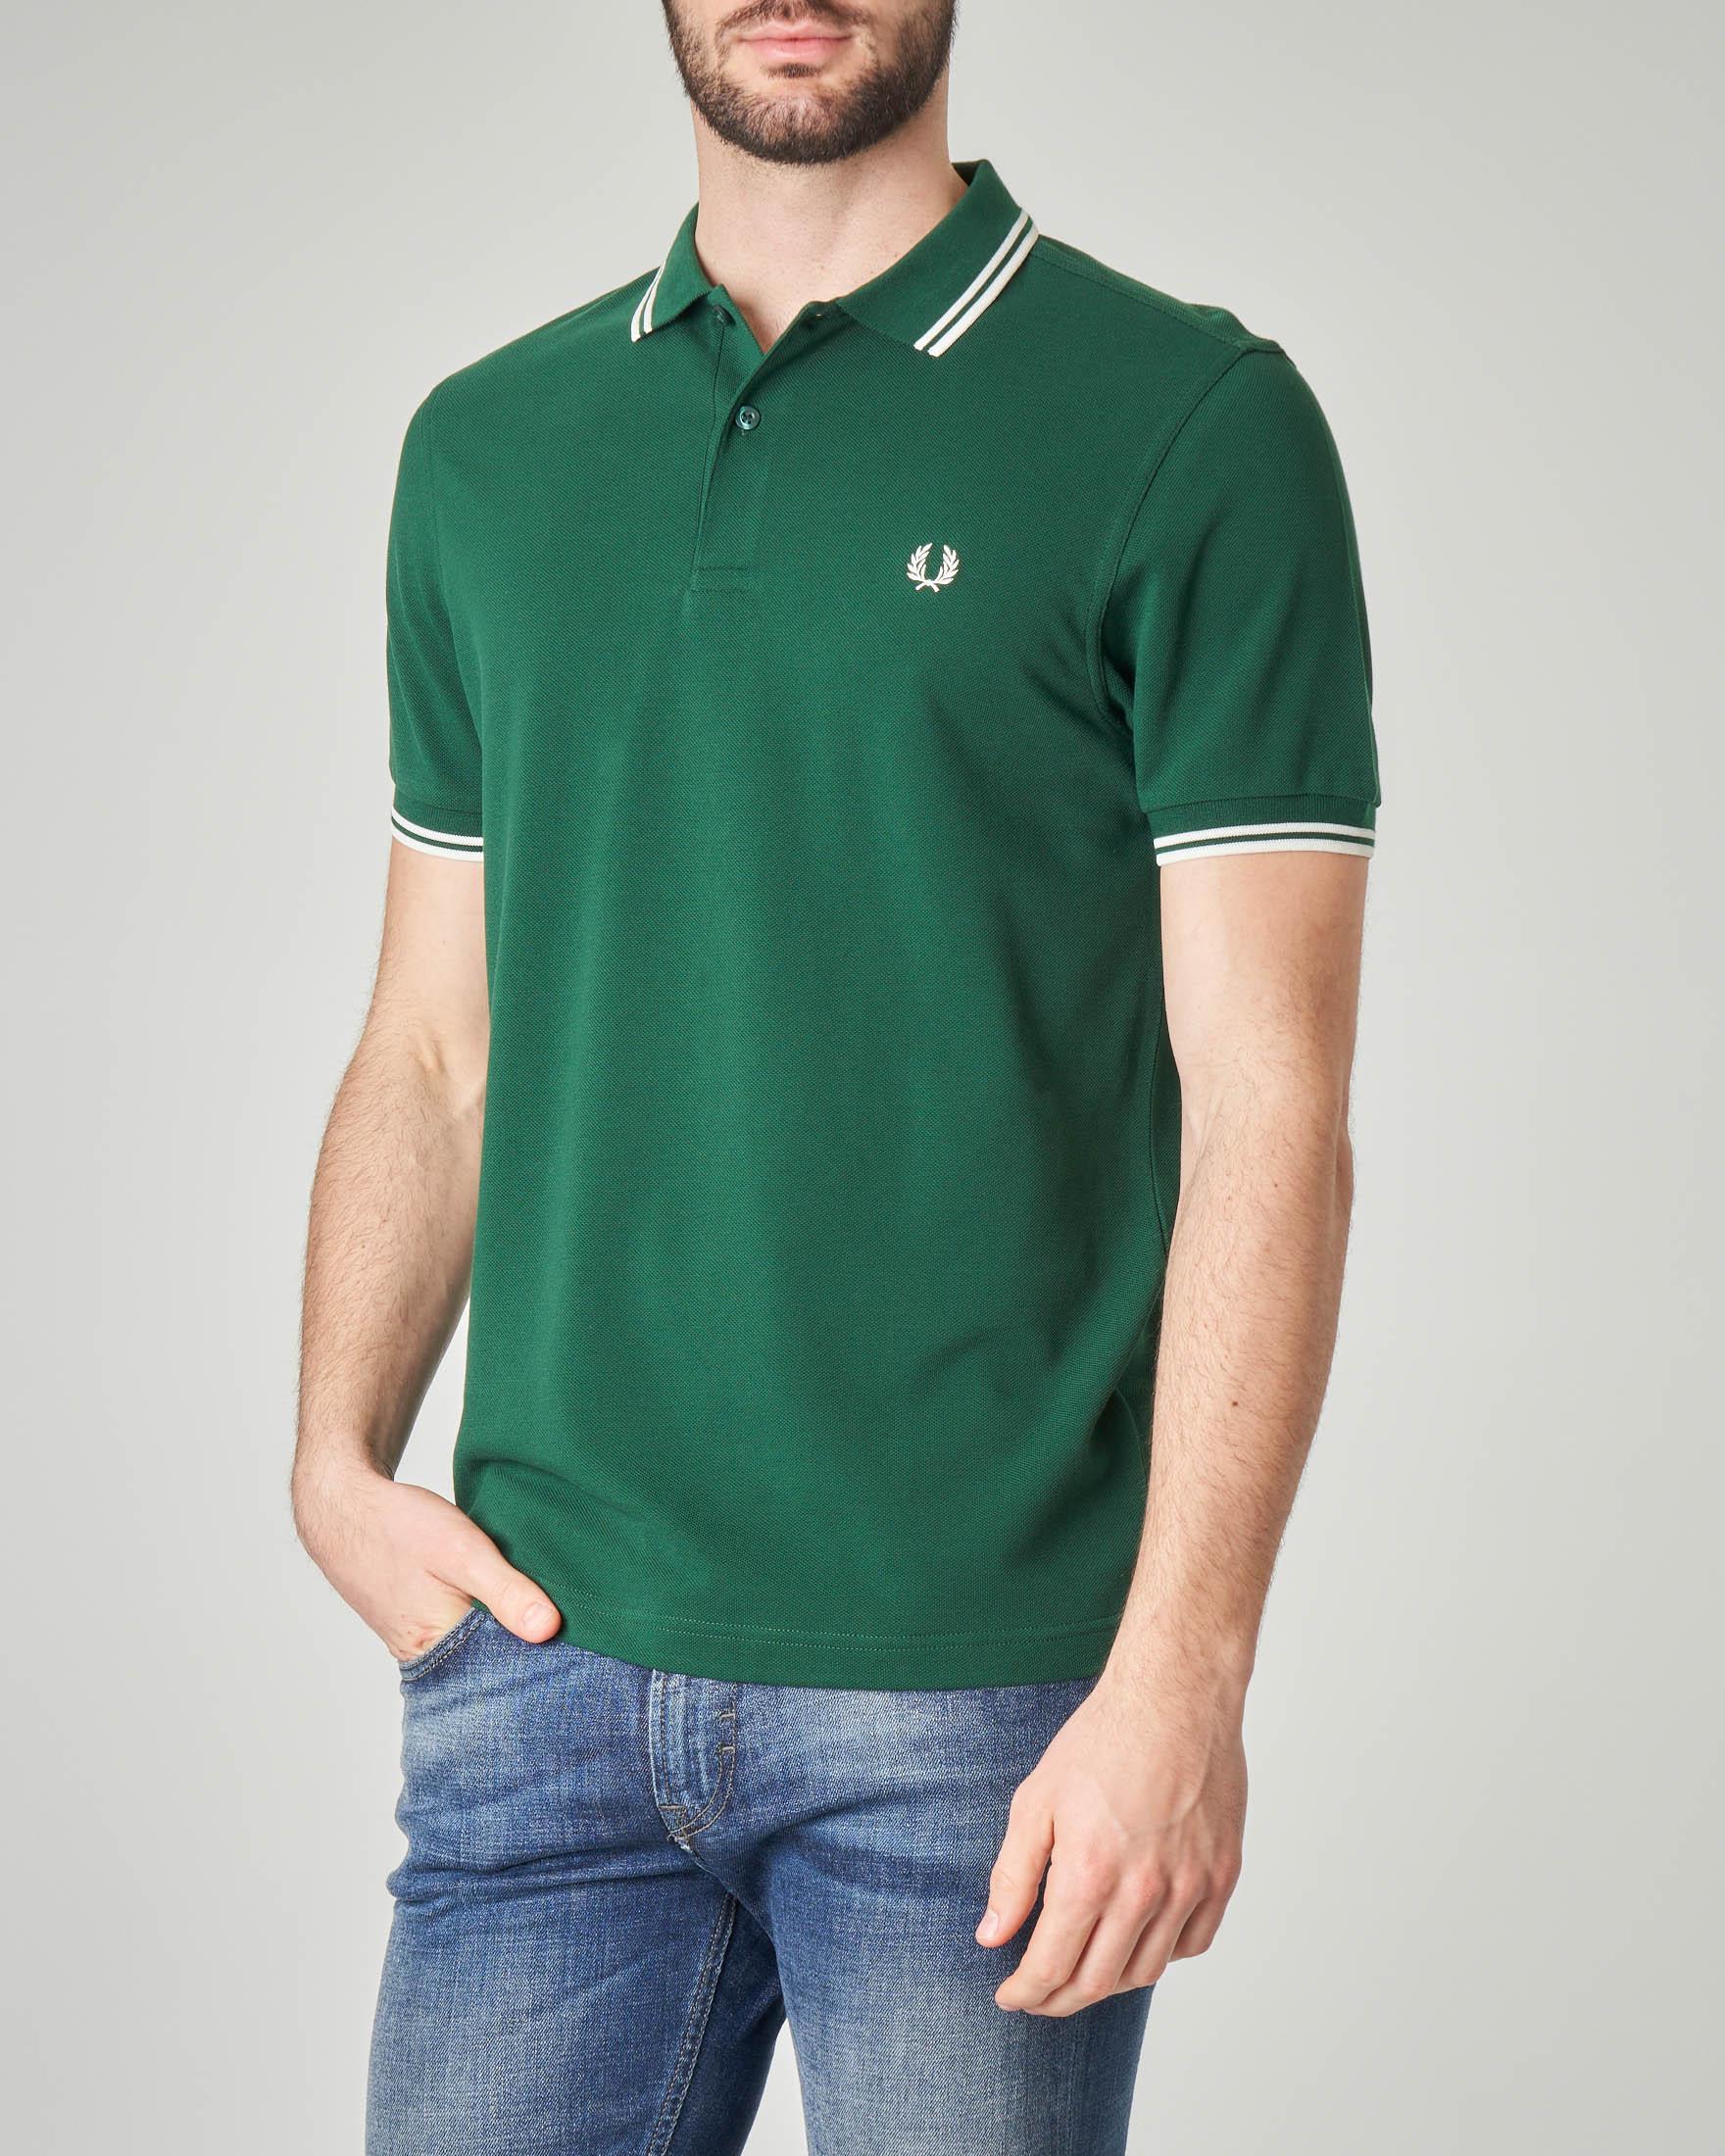 Polo verde con bordino bianco